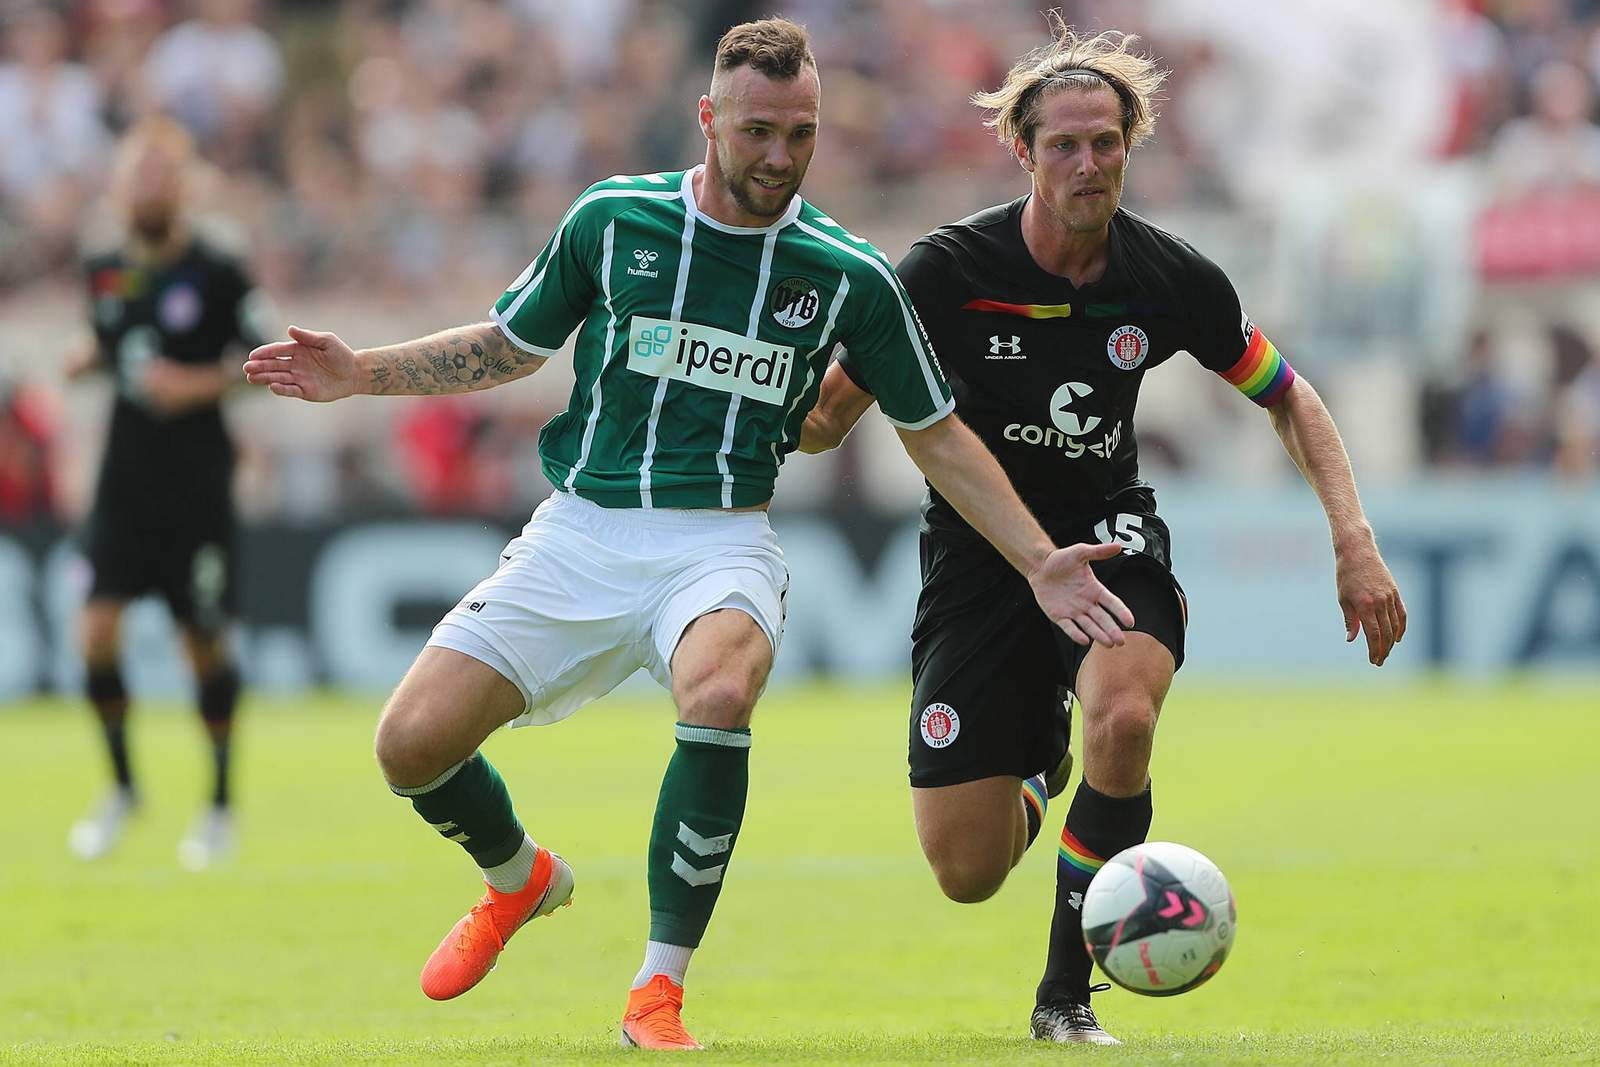 Patrick Hobsch vom VfB Lübeck gegen Daniel Buballa vom FC St. Pauli